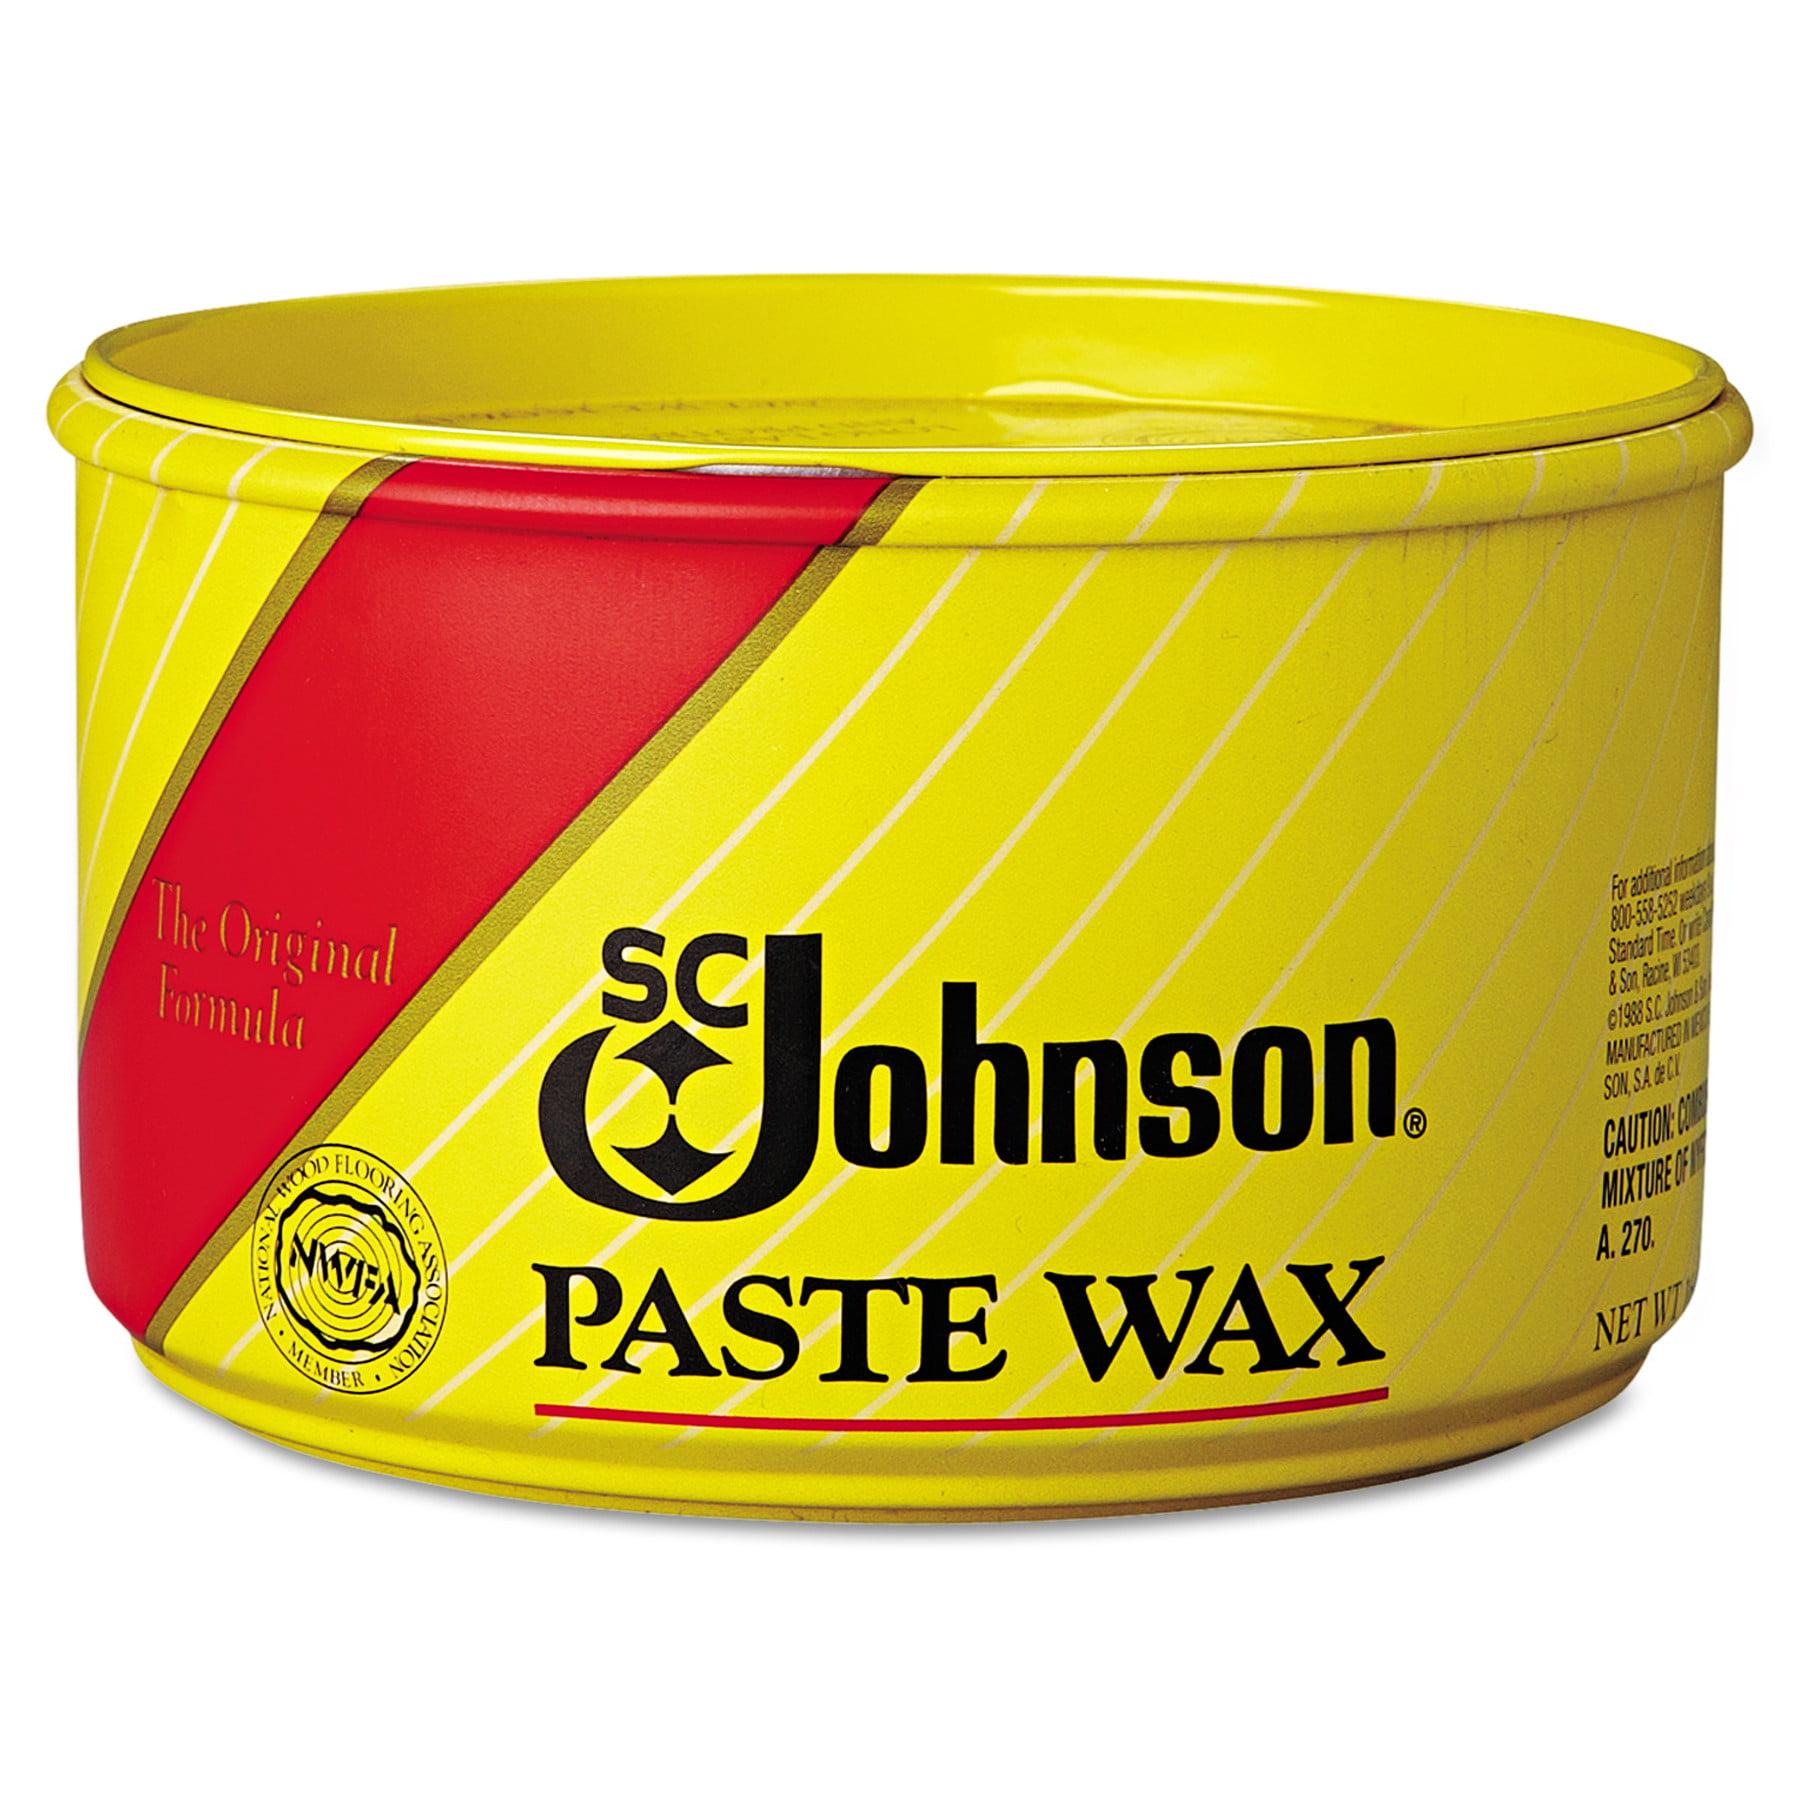 SC Johnson Paste Wax, Multi-Purpose Floor Protector, 16oz...